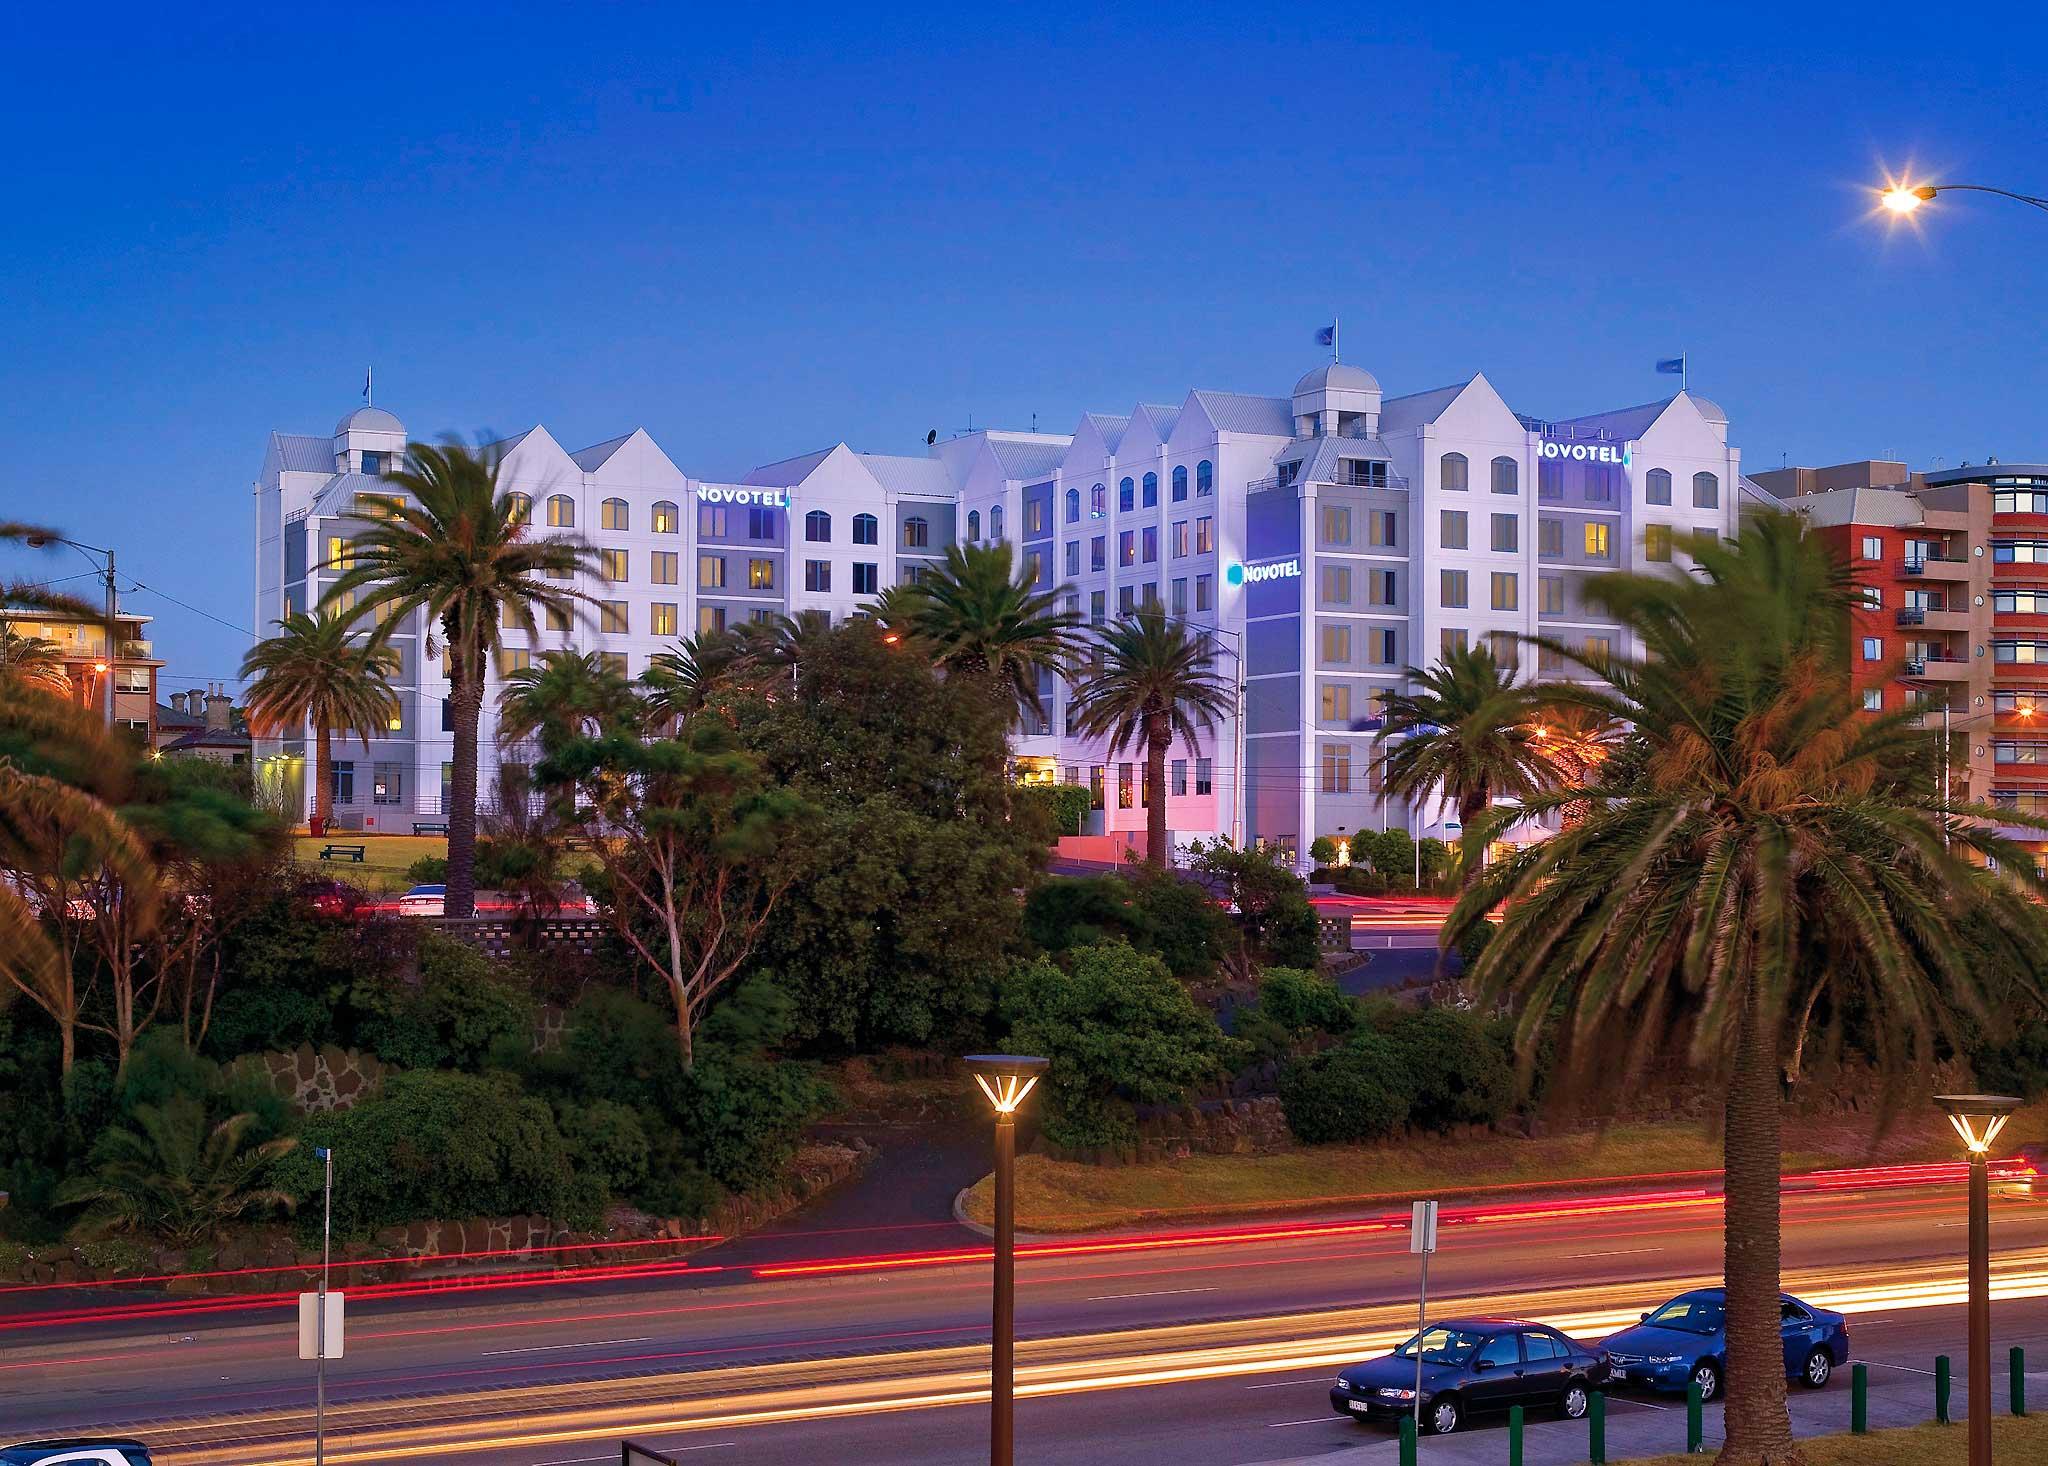 Hotel – Novotel Melbourne St Kilda